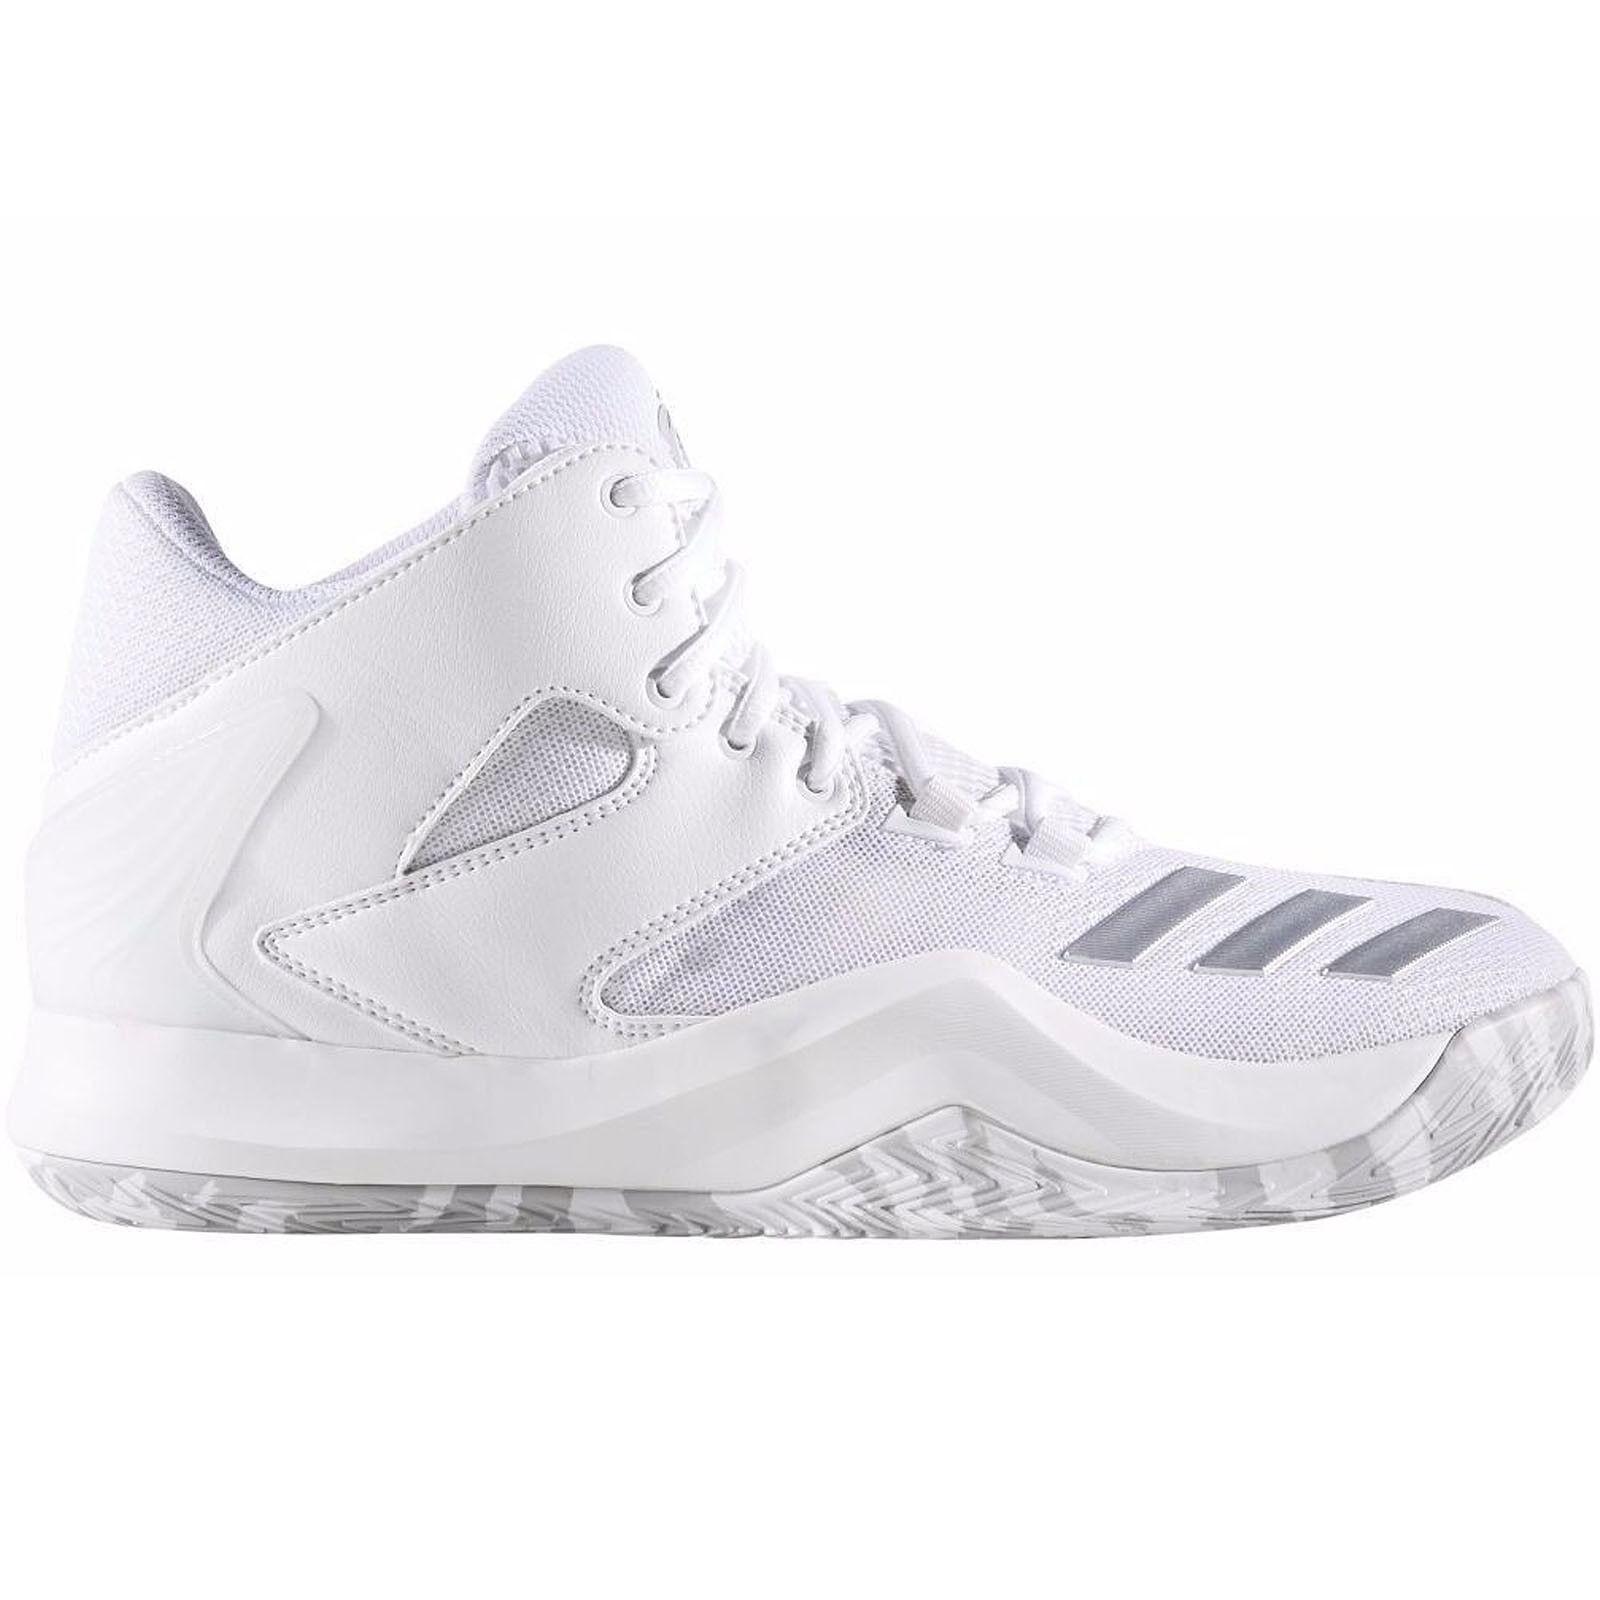 Adidas Performance Mens Derrick pink 773 V Basketball Hi Top Trainers shoes